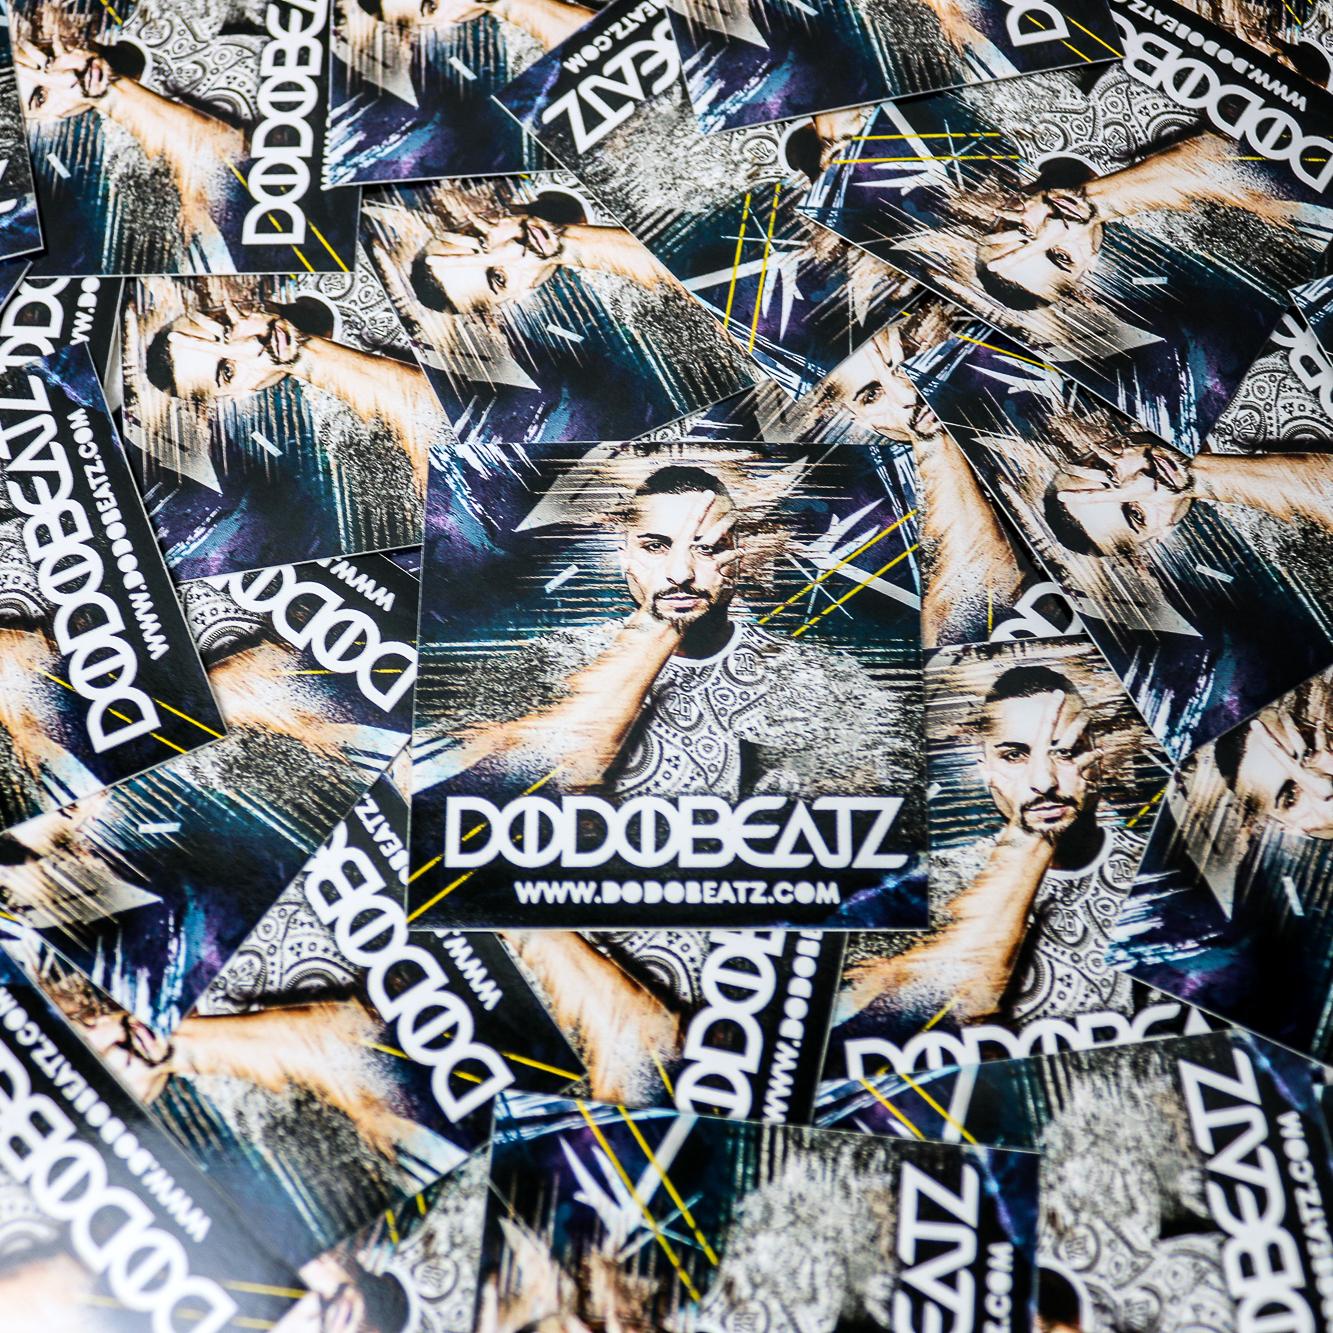 Dodobeatz Minimal Techno Underground